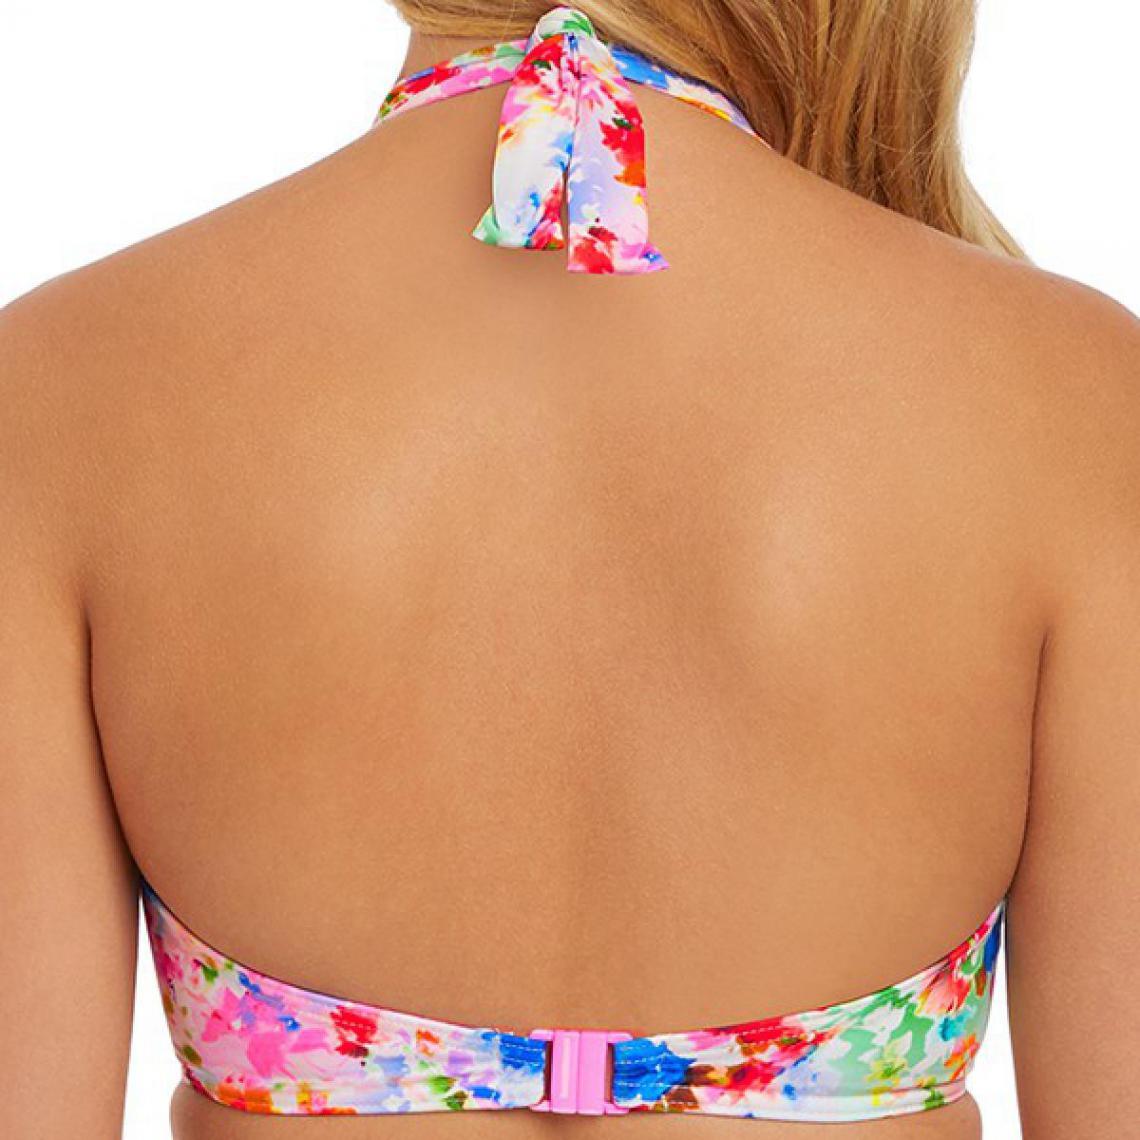 e090d5afcd Haut de maillot de bain tour de cou à armatures Freya ENDELESS SUMMER  confetti-Freya Maillots